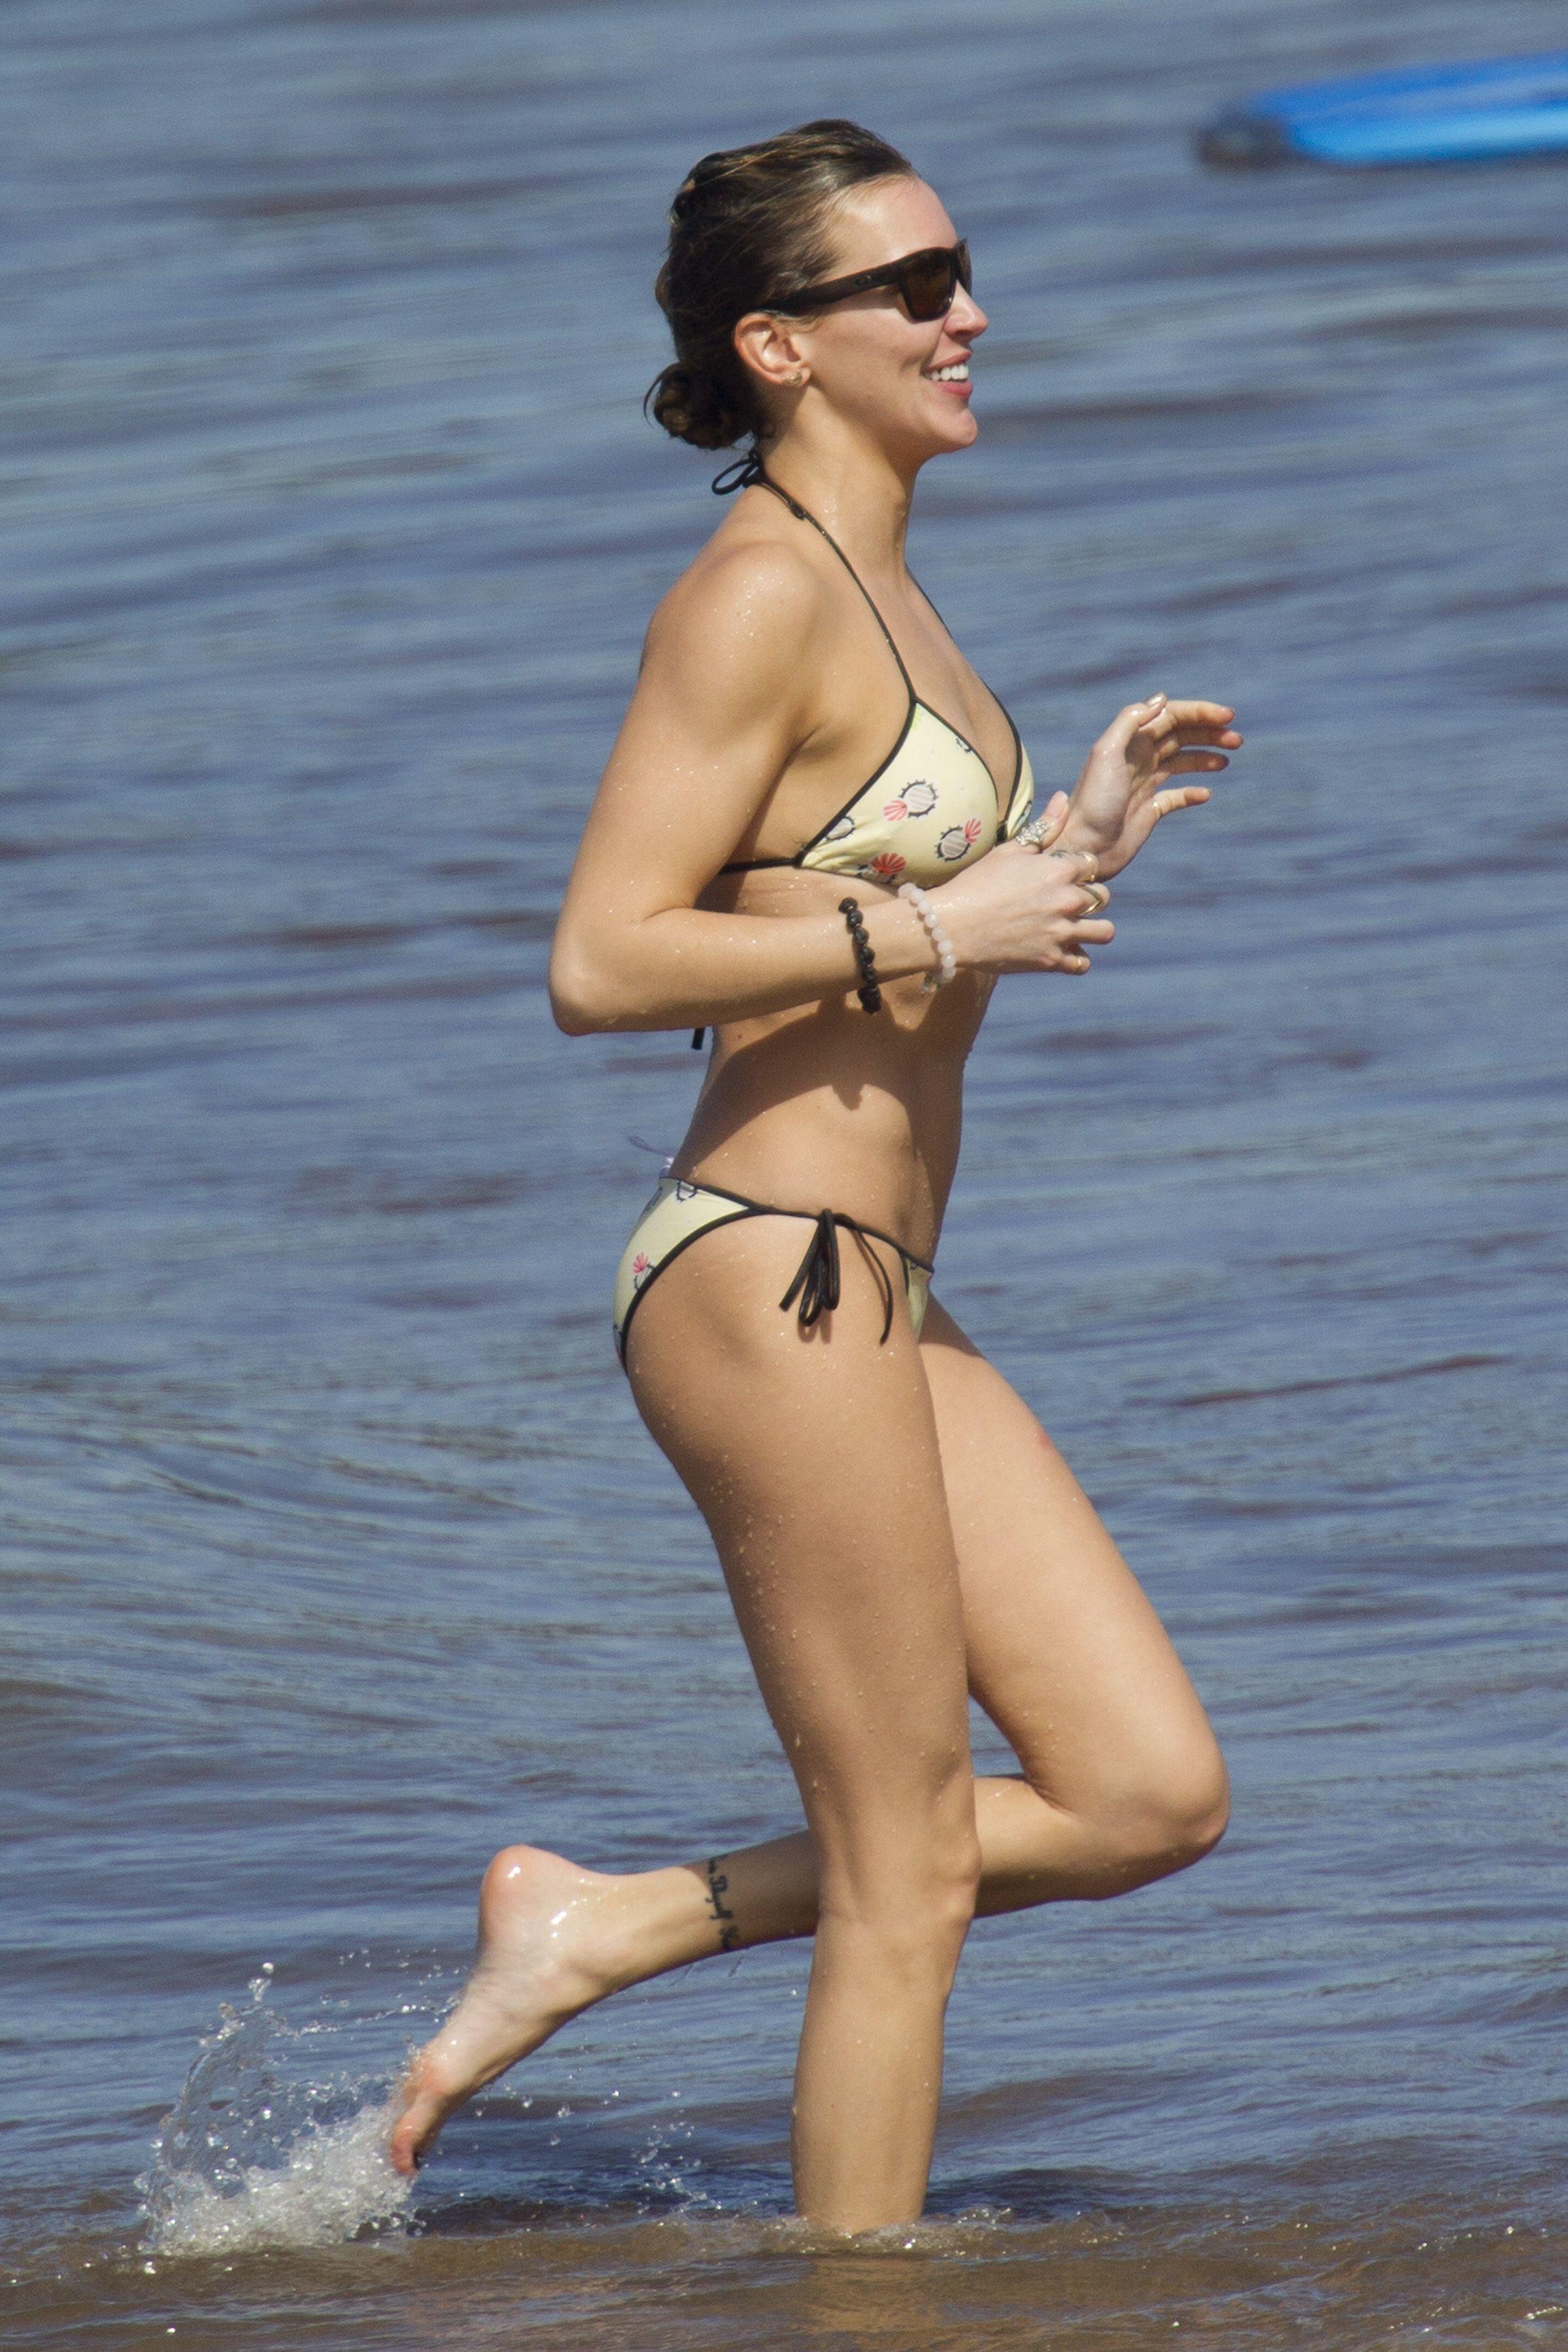 Bikini Pics Of Katie Cass...